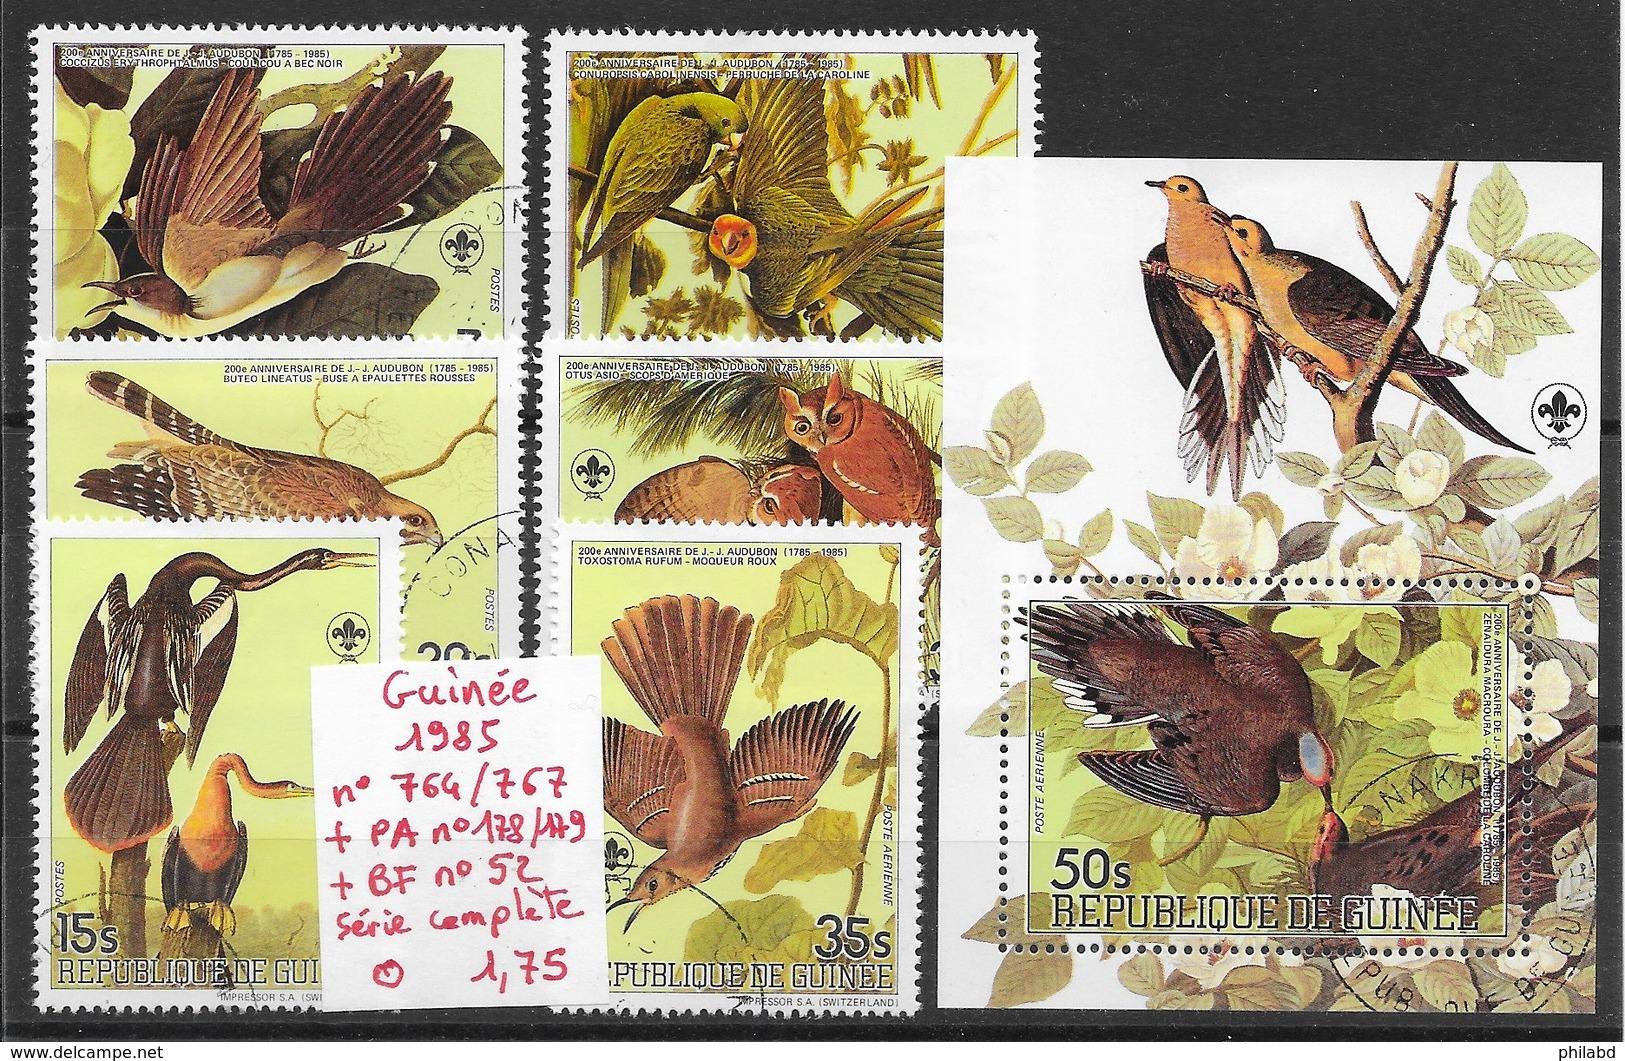 Oiseau Cormoran Hibou Perroquet Rapace  - Guinée N°764 à 767, PA N°178 & 179, BF N°52 1985 O - Non Classés